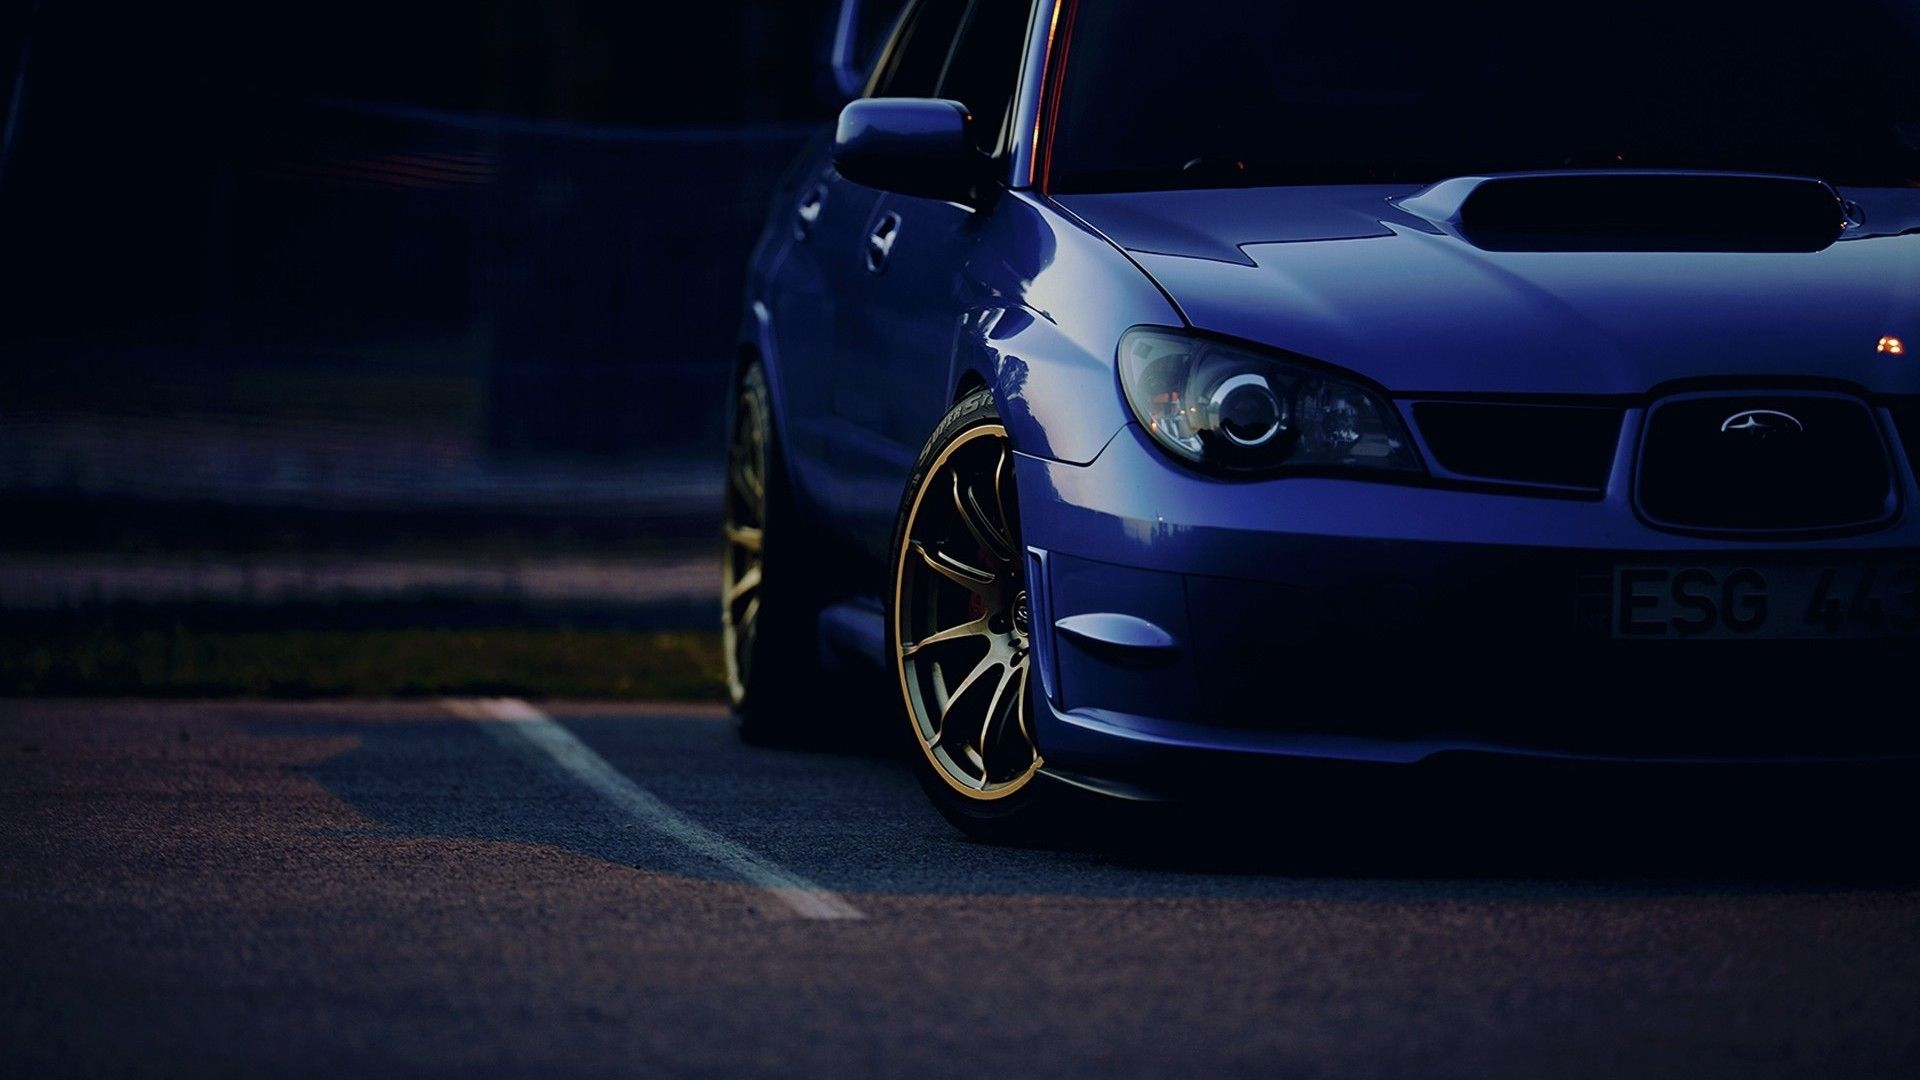 Epic Car Wallpapers: Subaru Impreza WRX STi Wallpapers - Wallpaper Cave